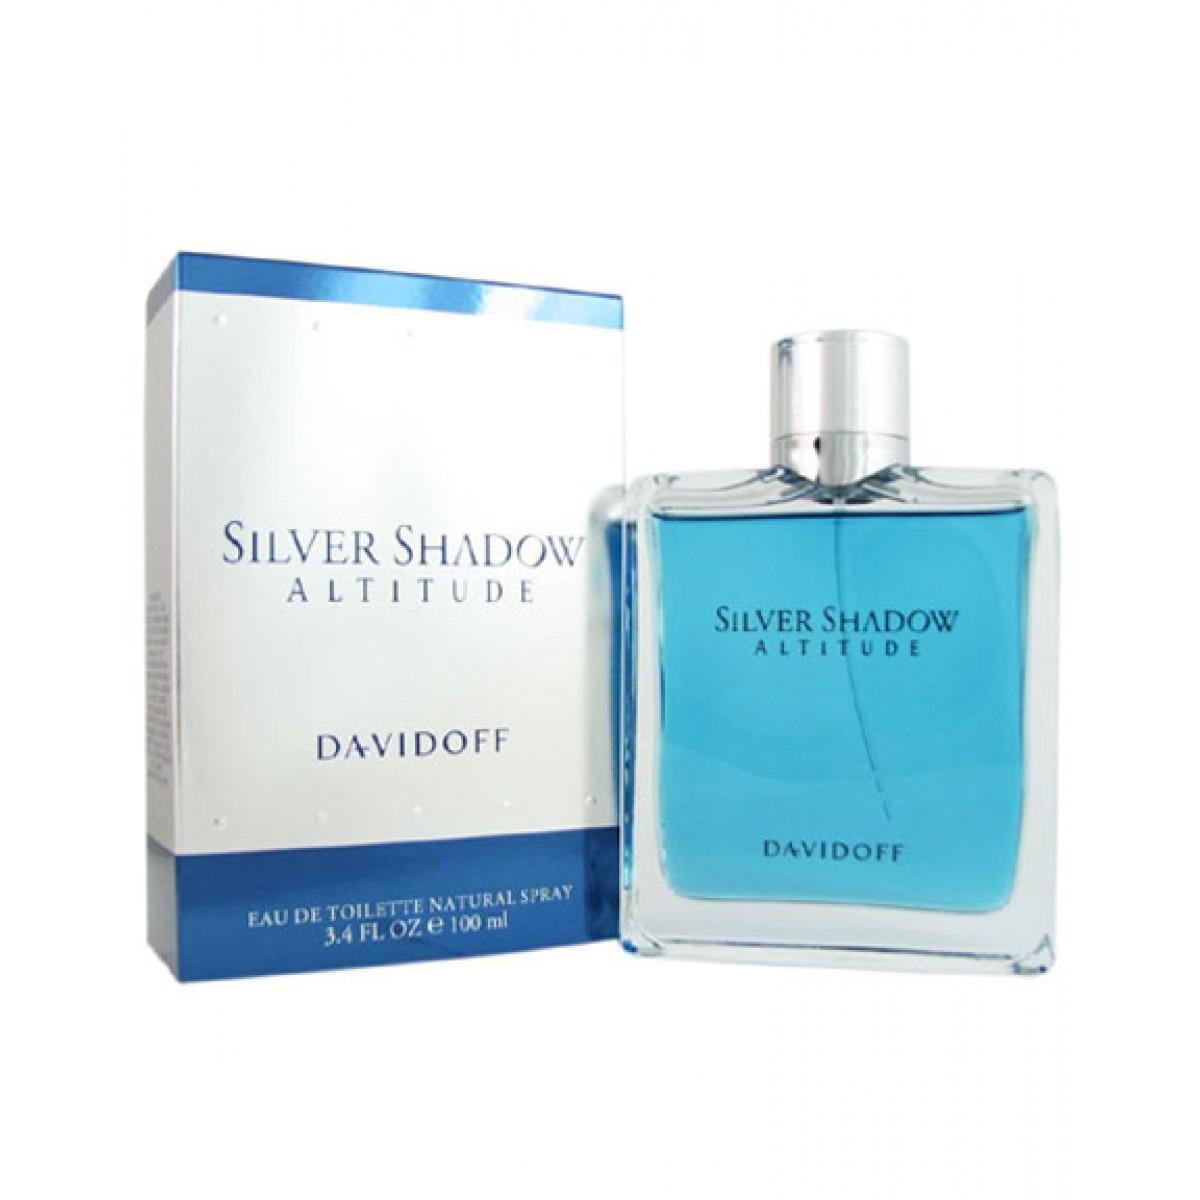 Davidoff Silver Shadow Altitude Eau De Toilette Price In Pakistan